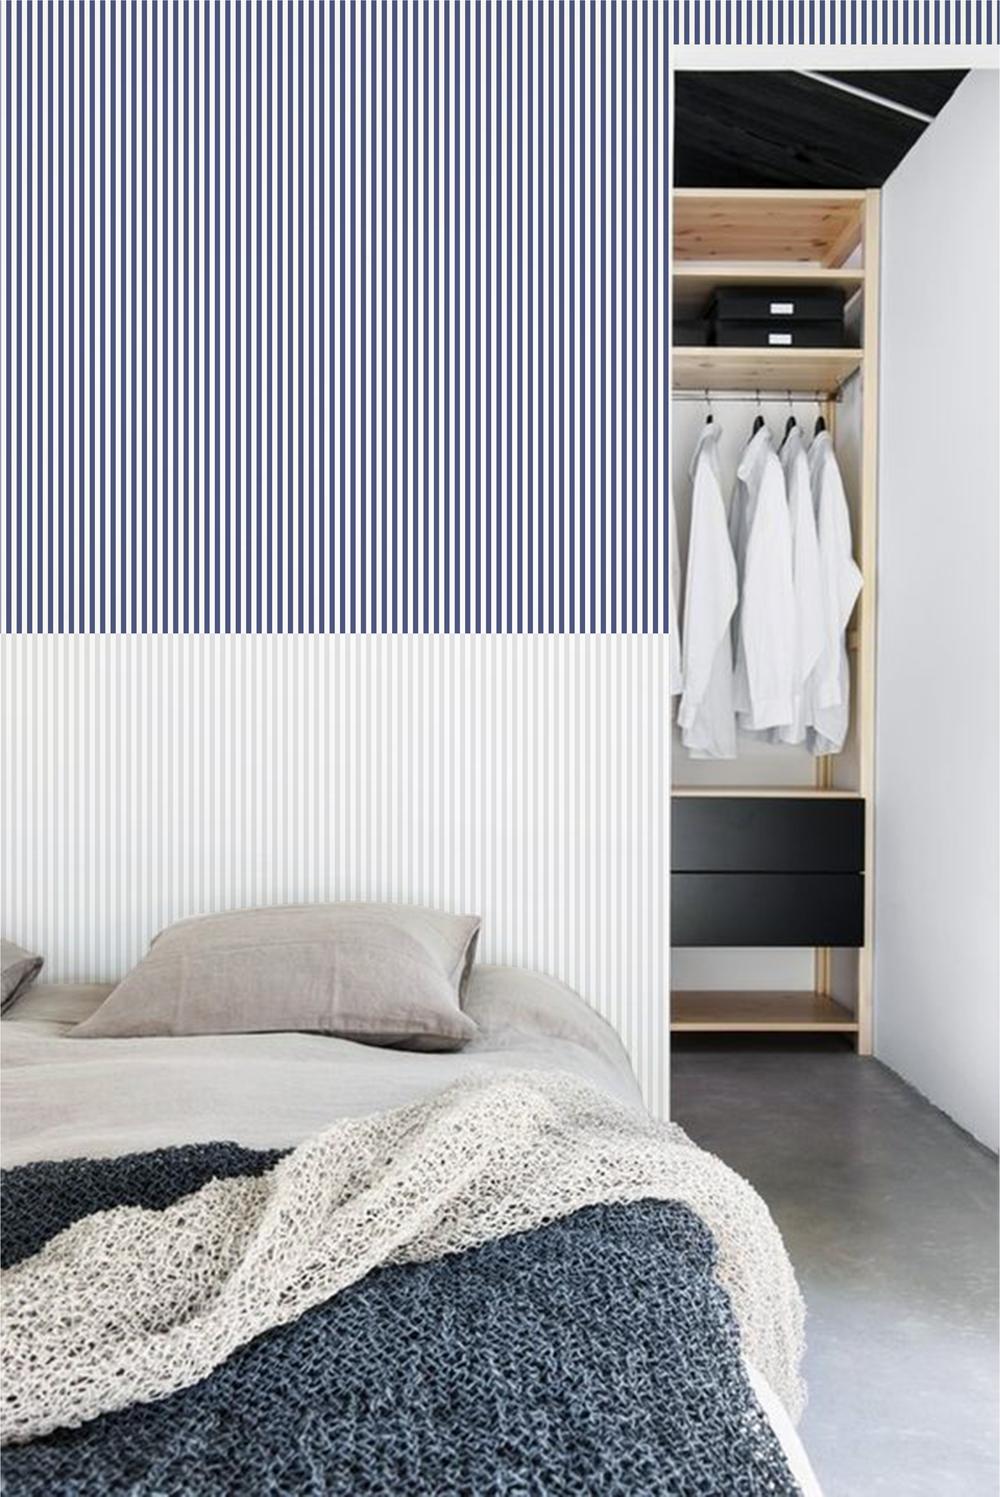 quarto-closet-papel-listras-2papeis-housed-wallpaper2.png